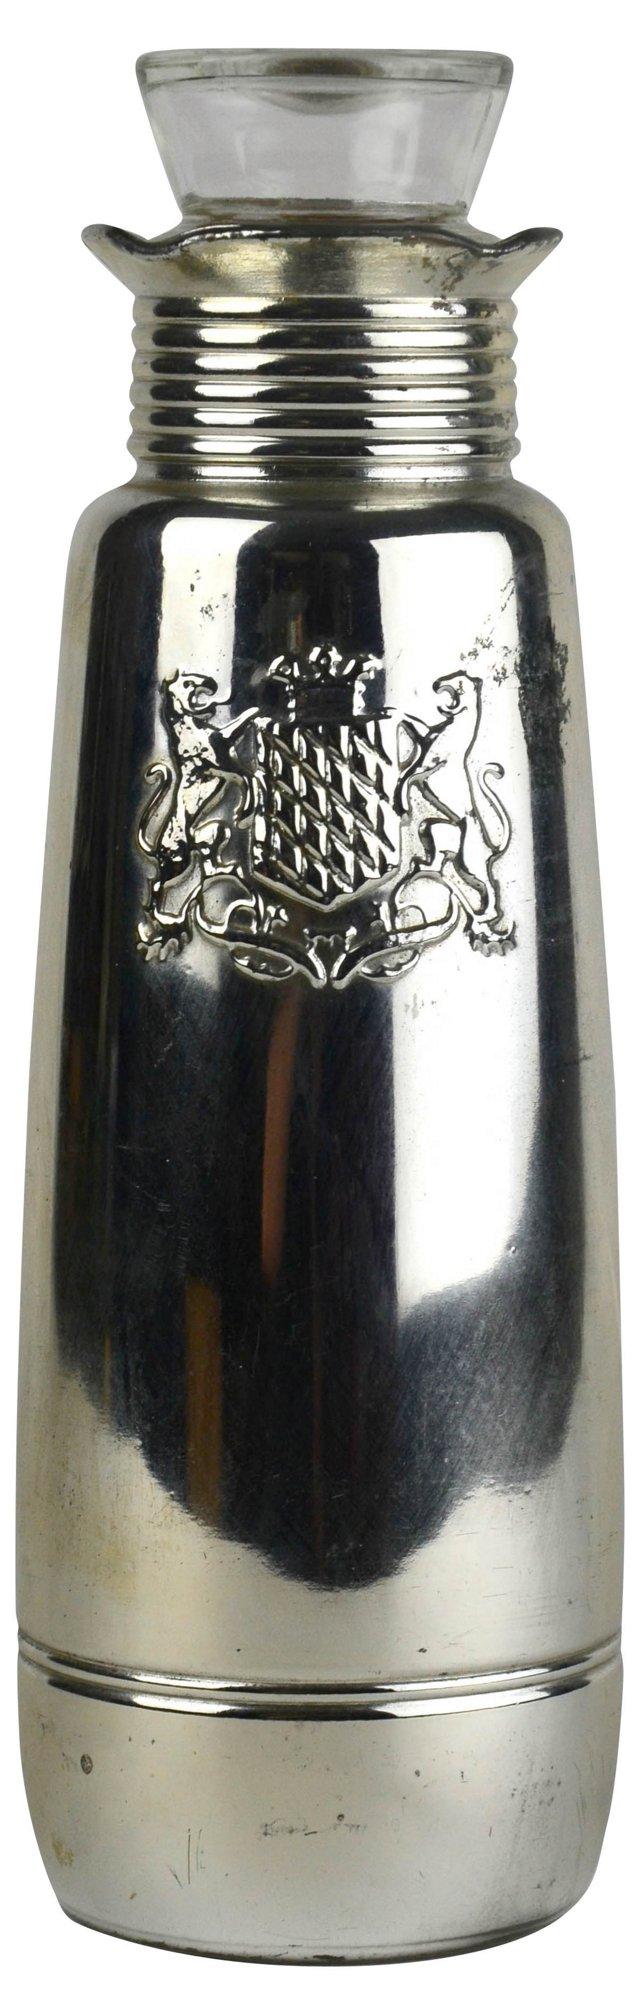 Mercury Glass Crest Decanter